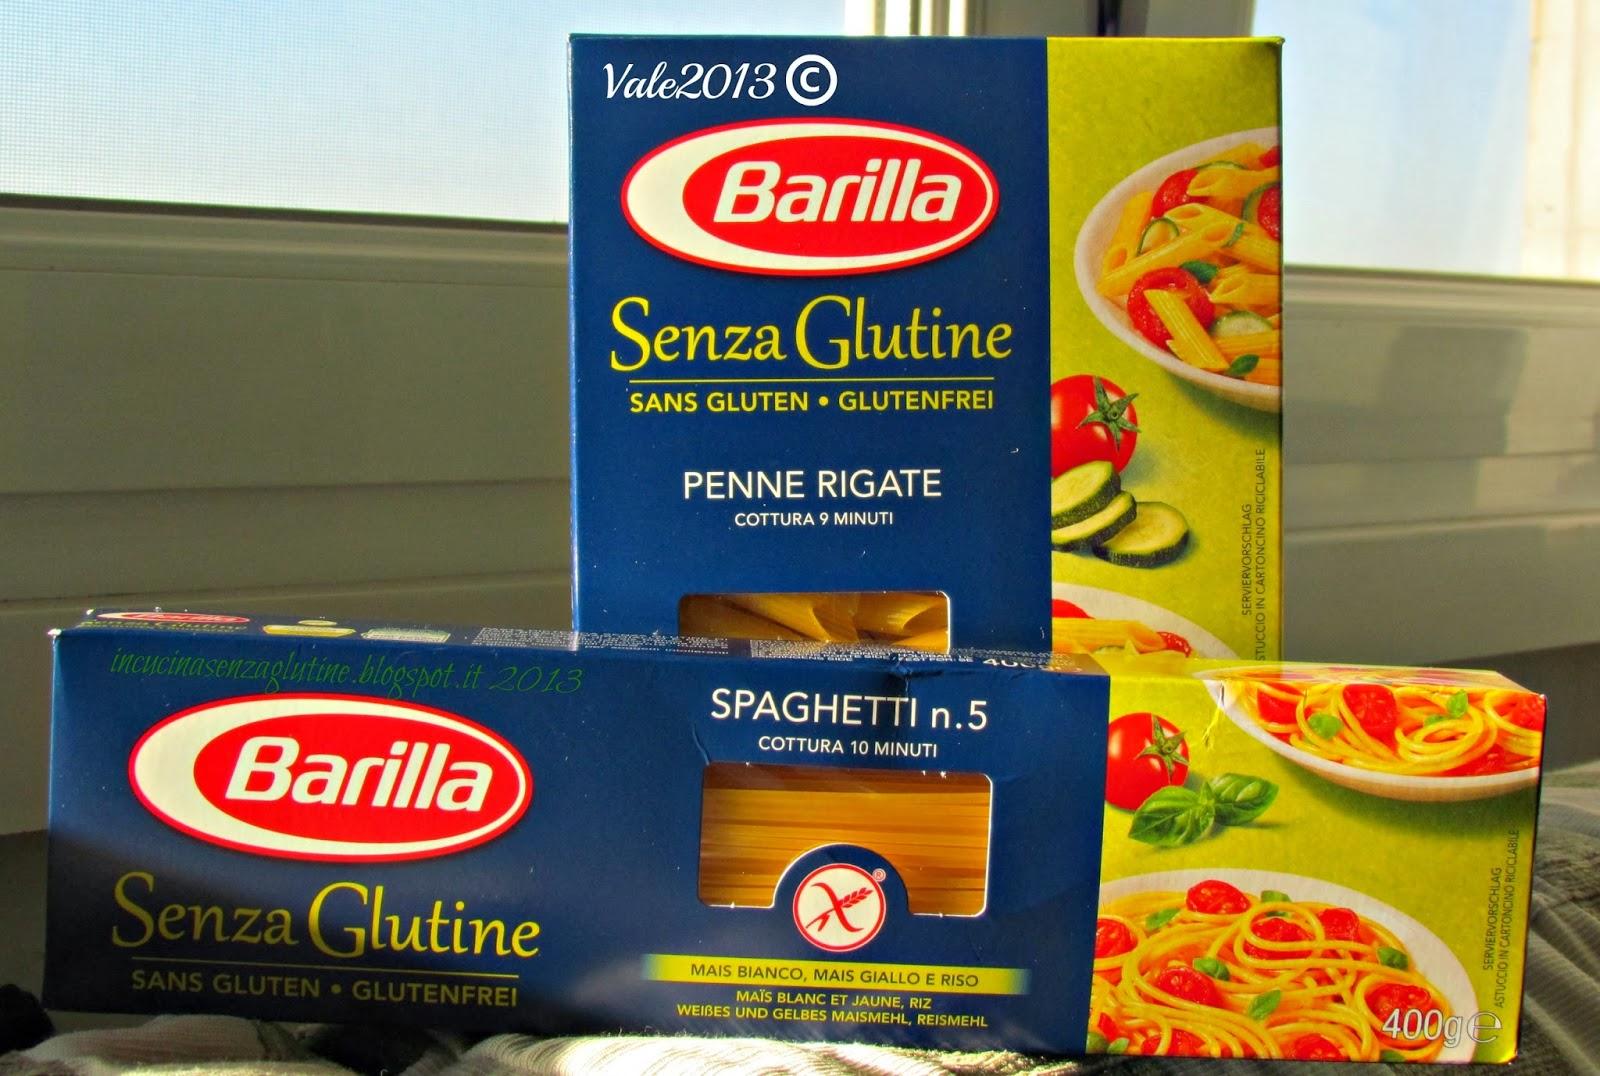 1076 Jpeg 287kB In Cucina Senza Glutine : Pasta Barilla Senza Glutine #C2AE09 1600 1076 Cucina Mediterranea Senza Glutine